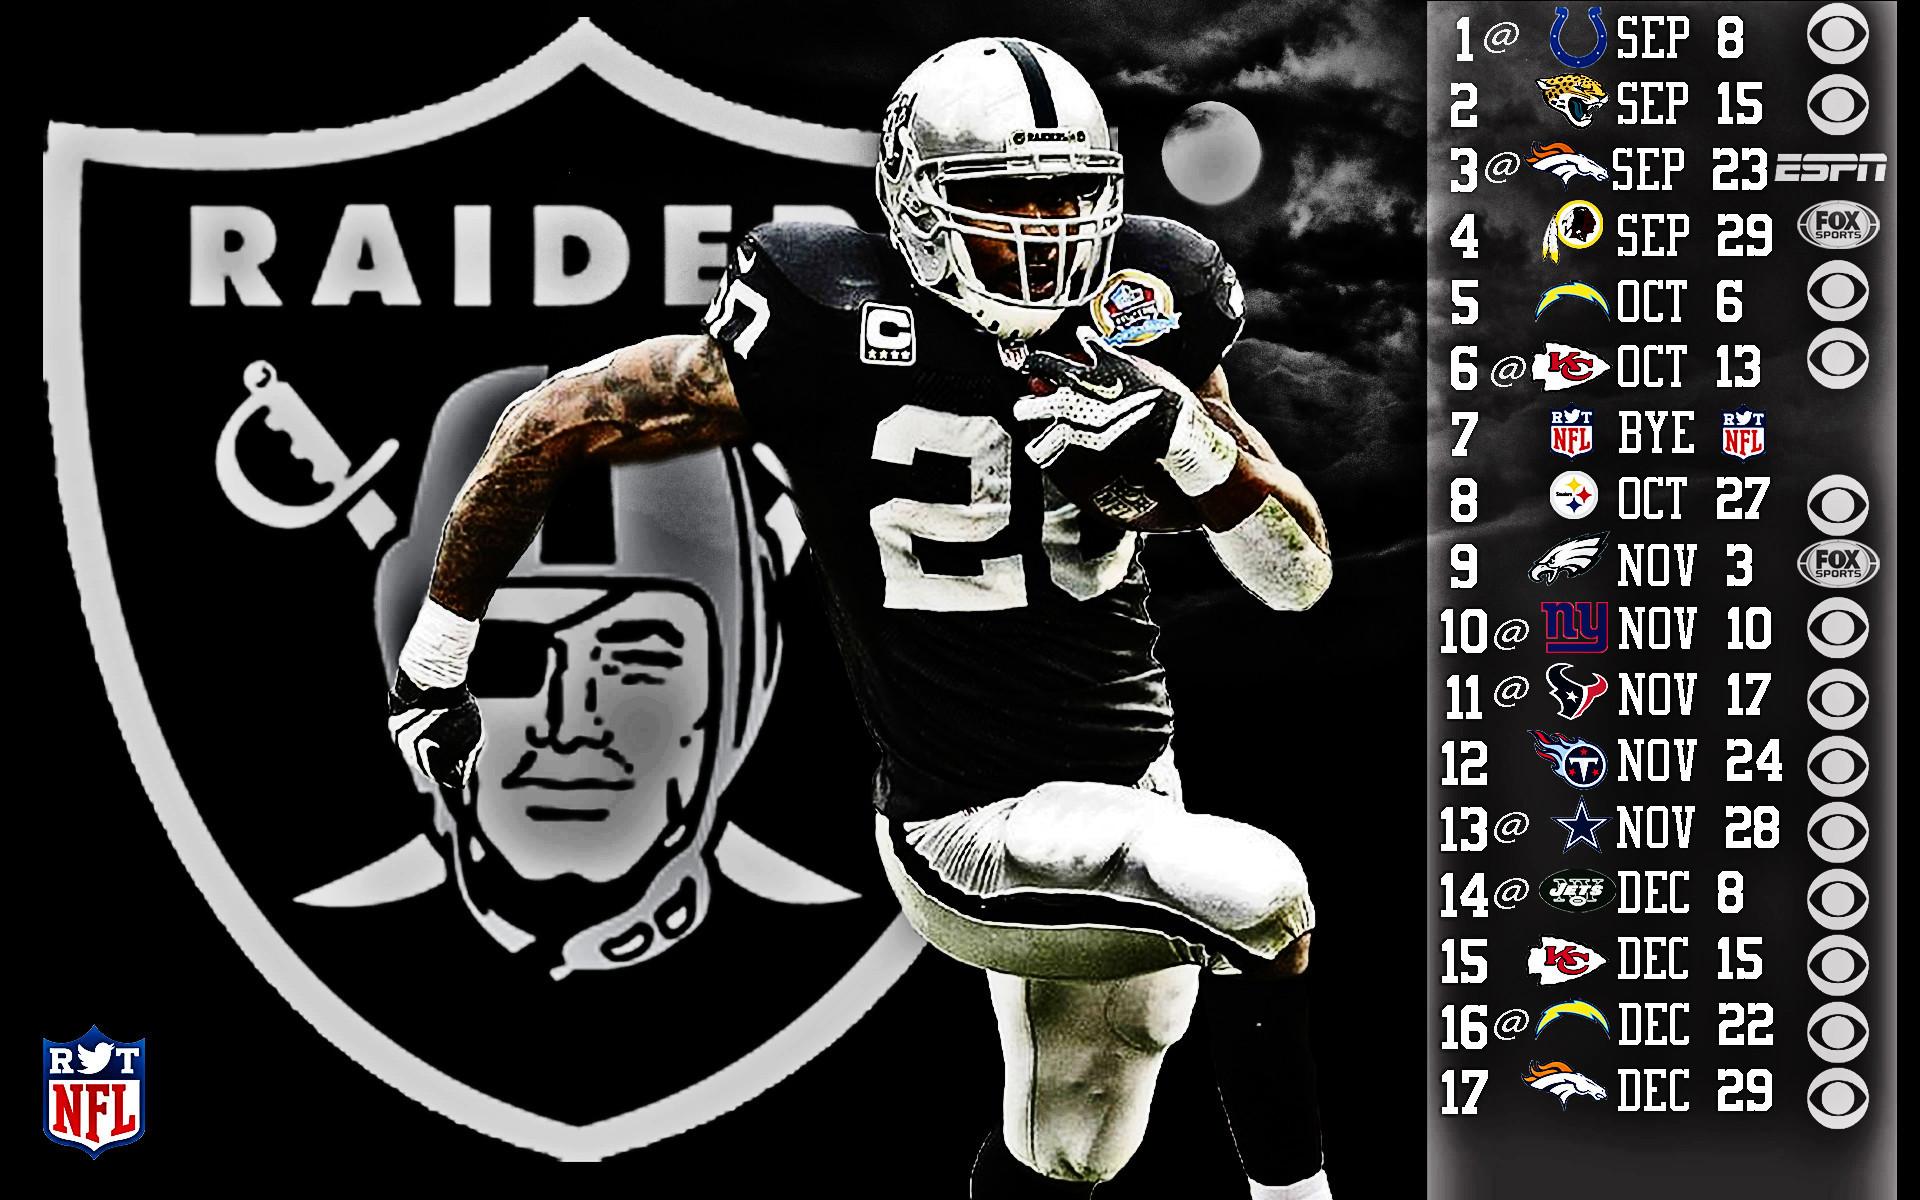 Raiders 2018 Wallpaper 1